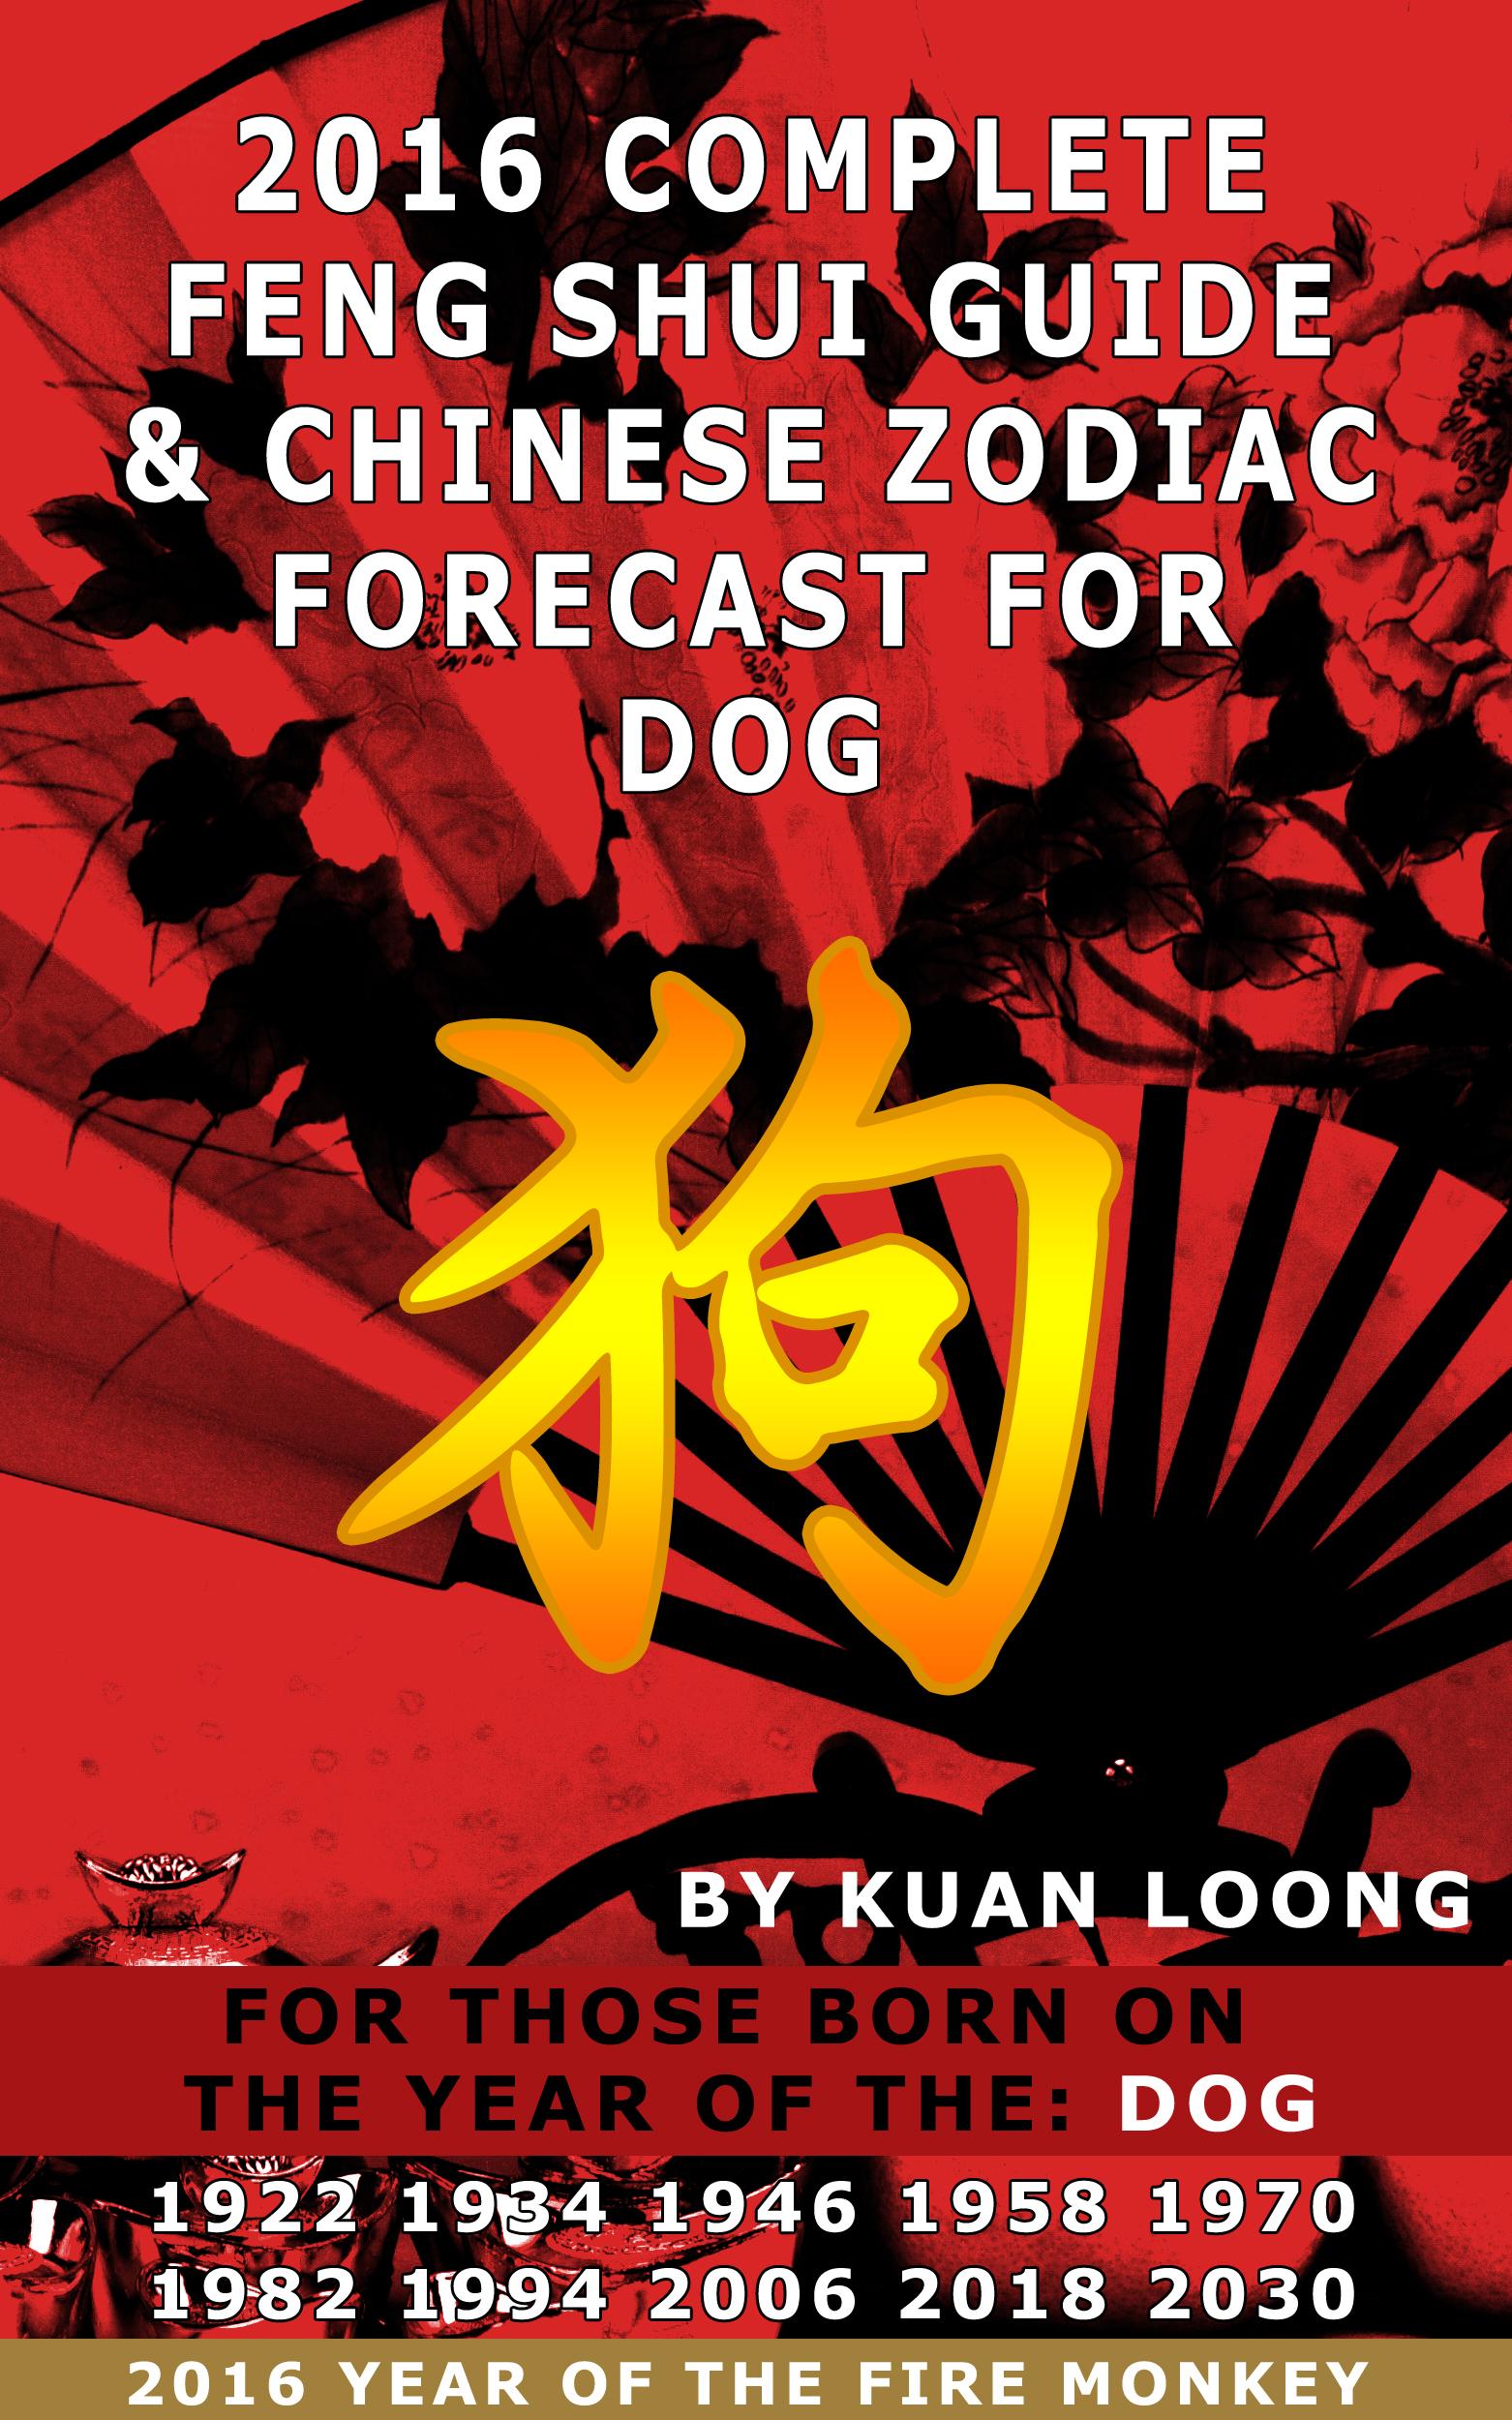 2016 Dog Feng Shui Guide & Chinese Zodiac Forecast, an Ebook by Kuan Loong